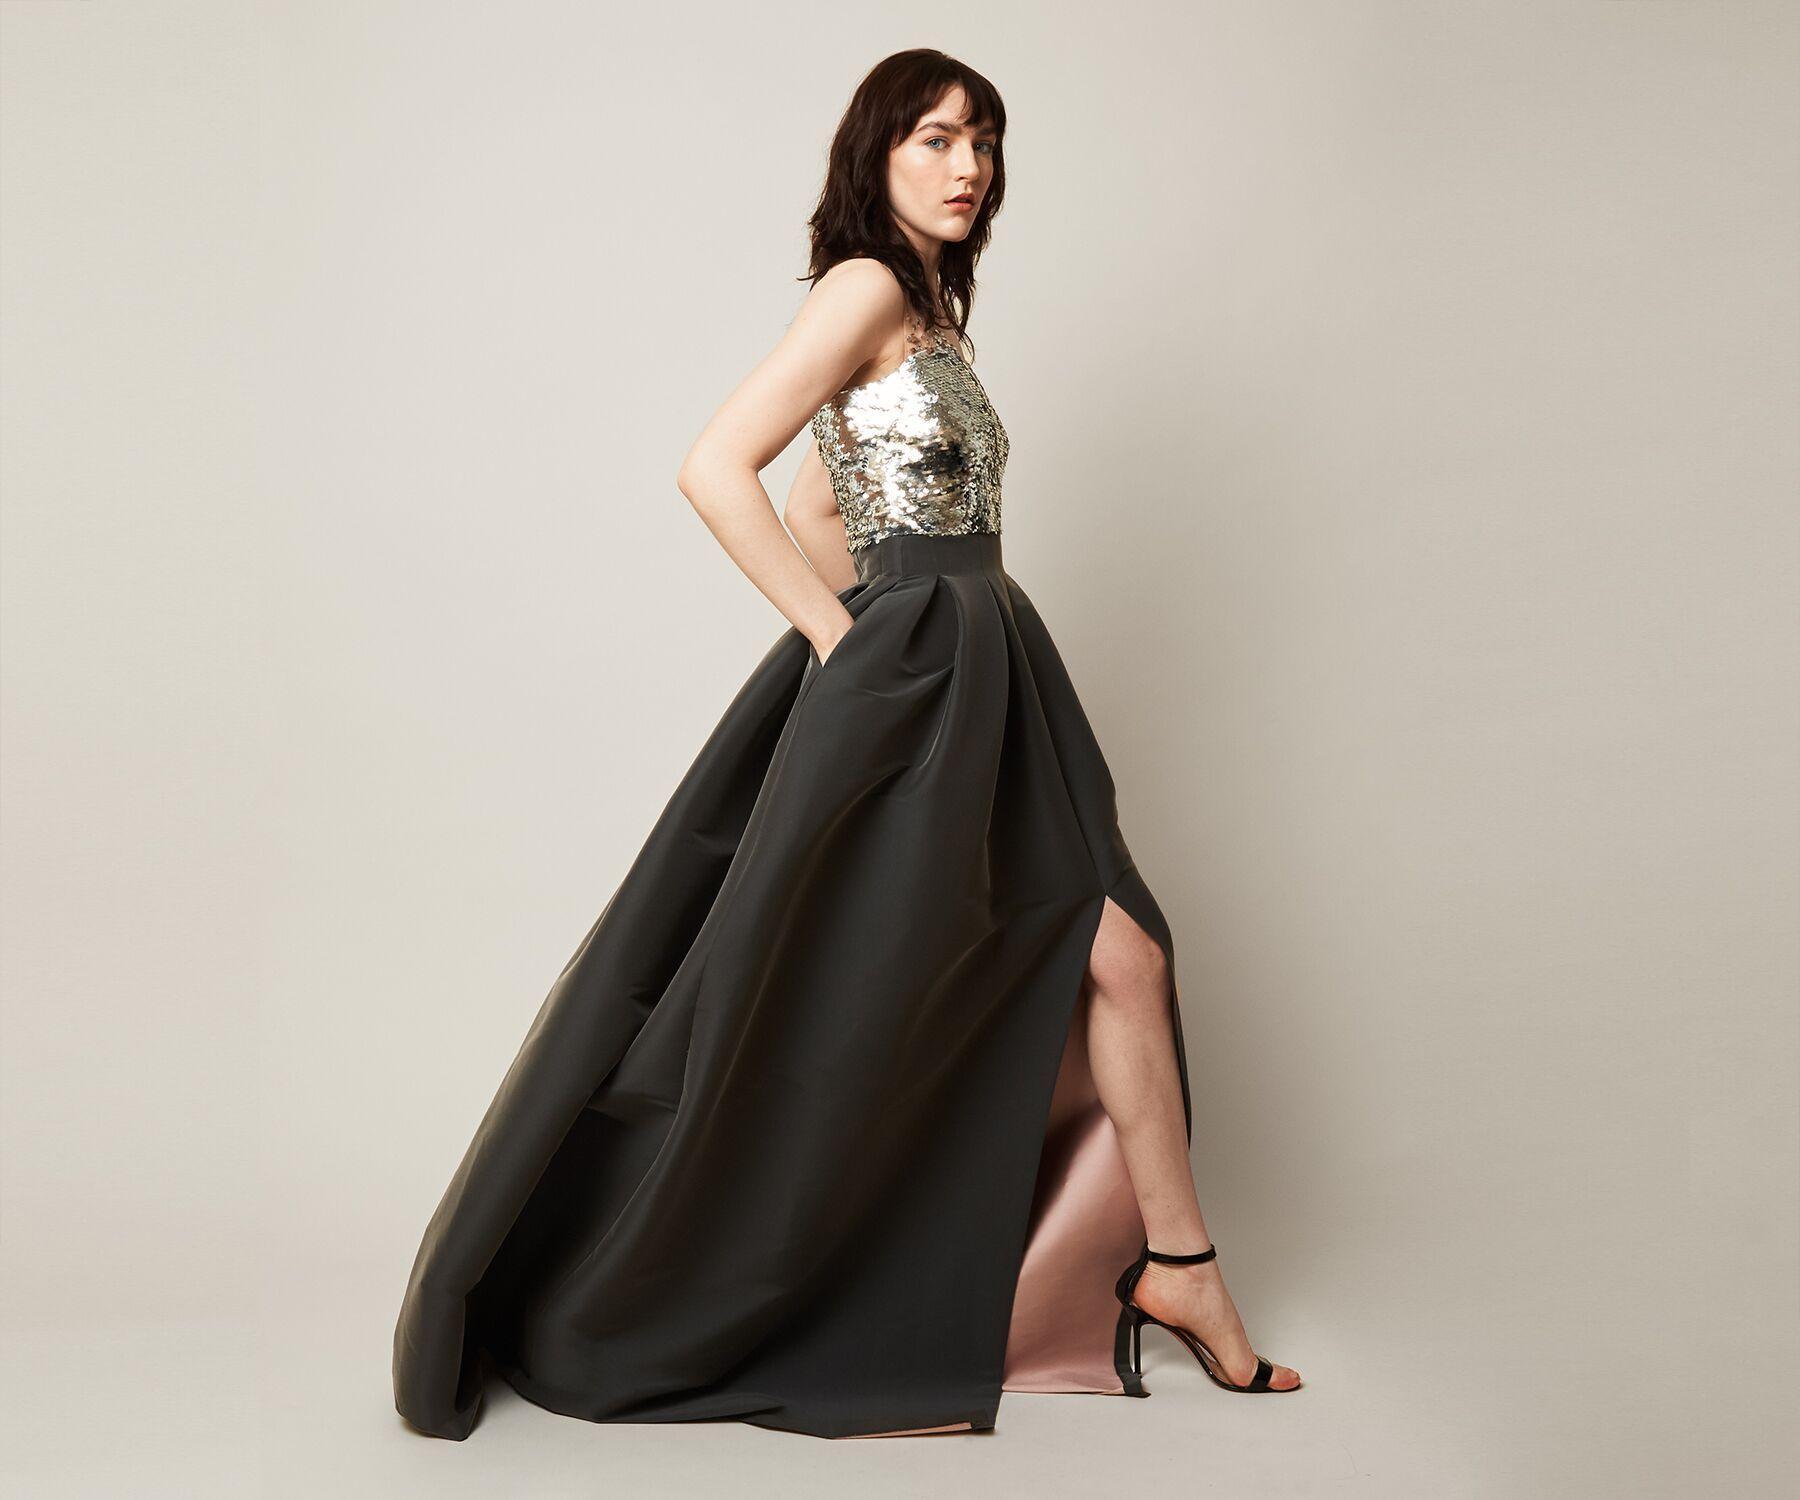 38c4d2626aa4 Sachin & Babi Elle Gown in Gray - Lyst